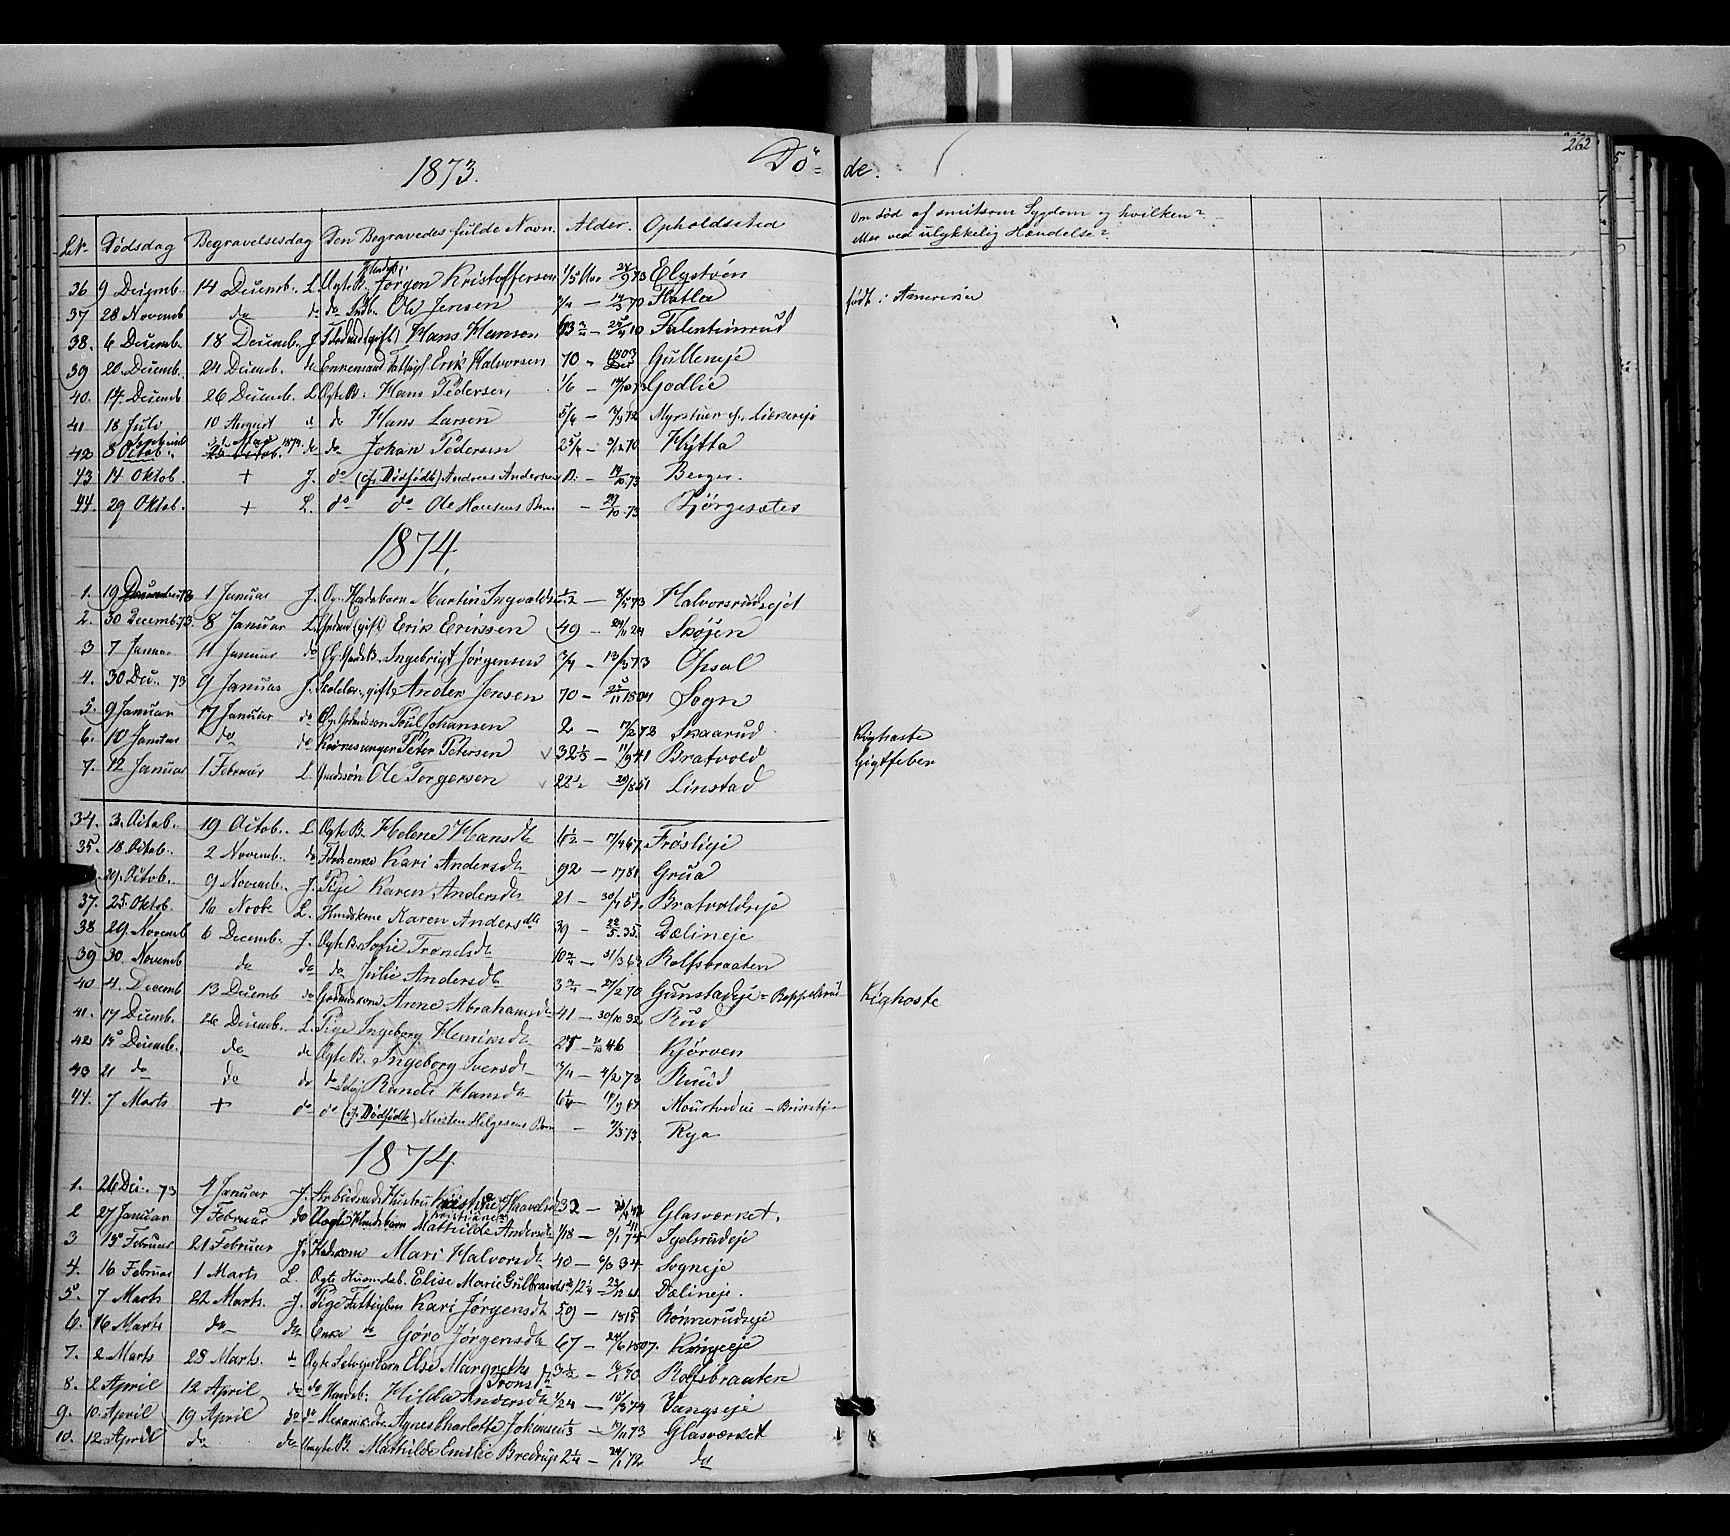 SAH, Jevnaker prestekontor, Ministerialbok nr. 7, 1858-1876, s. 262